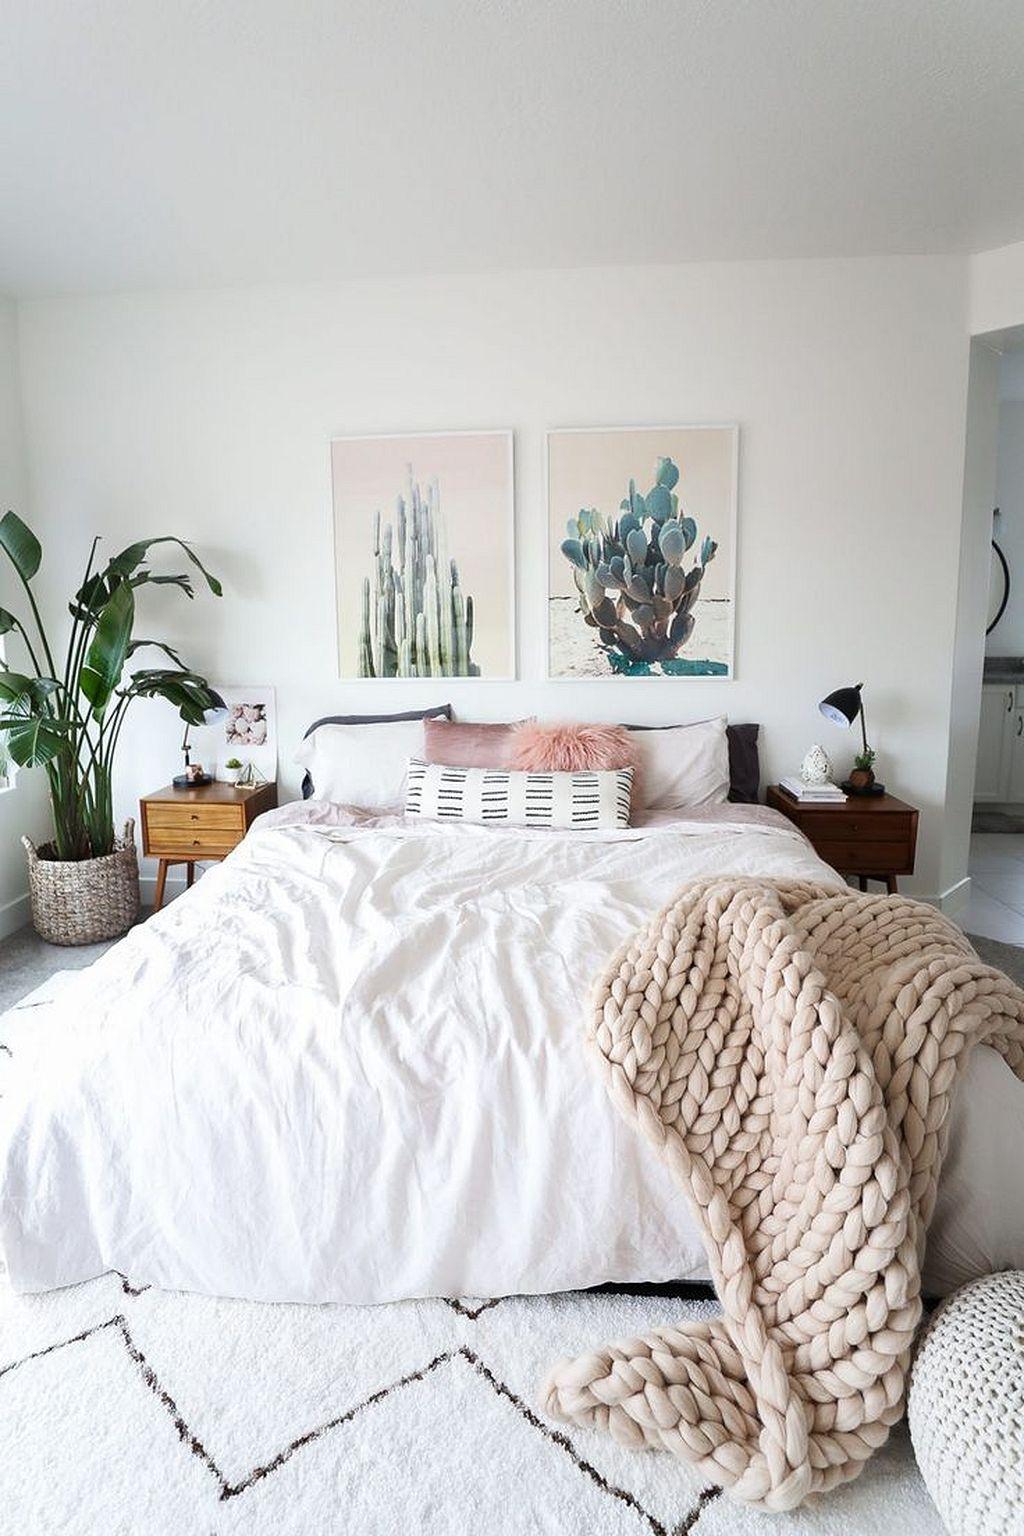 30 Boho Chic Bedroom Decor Ideas With